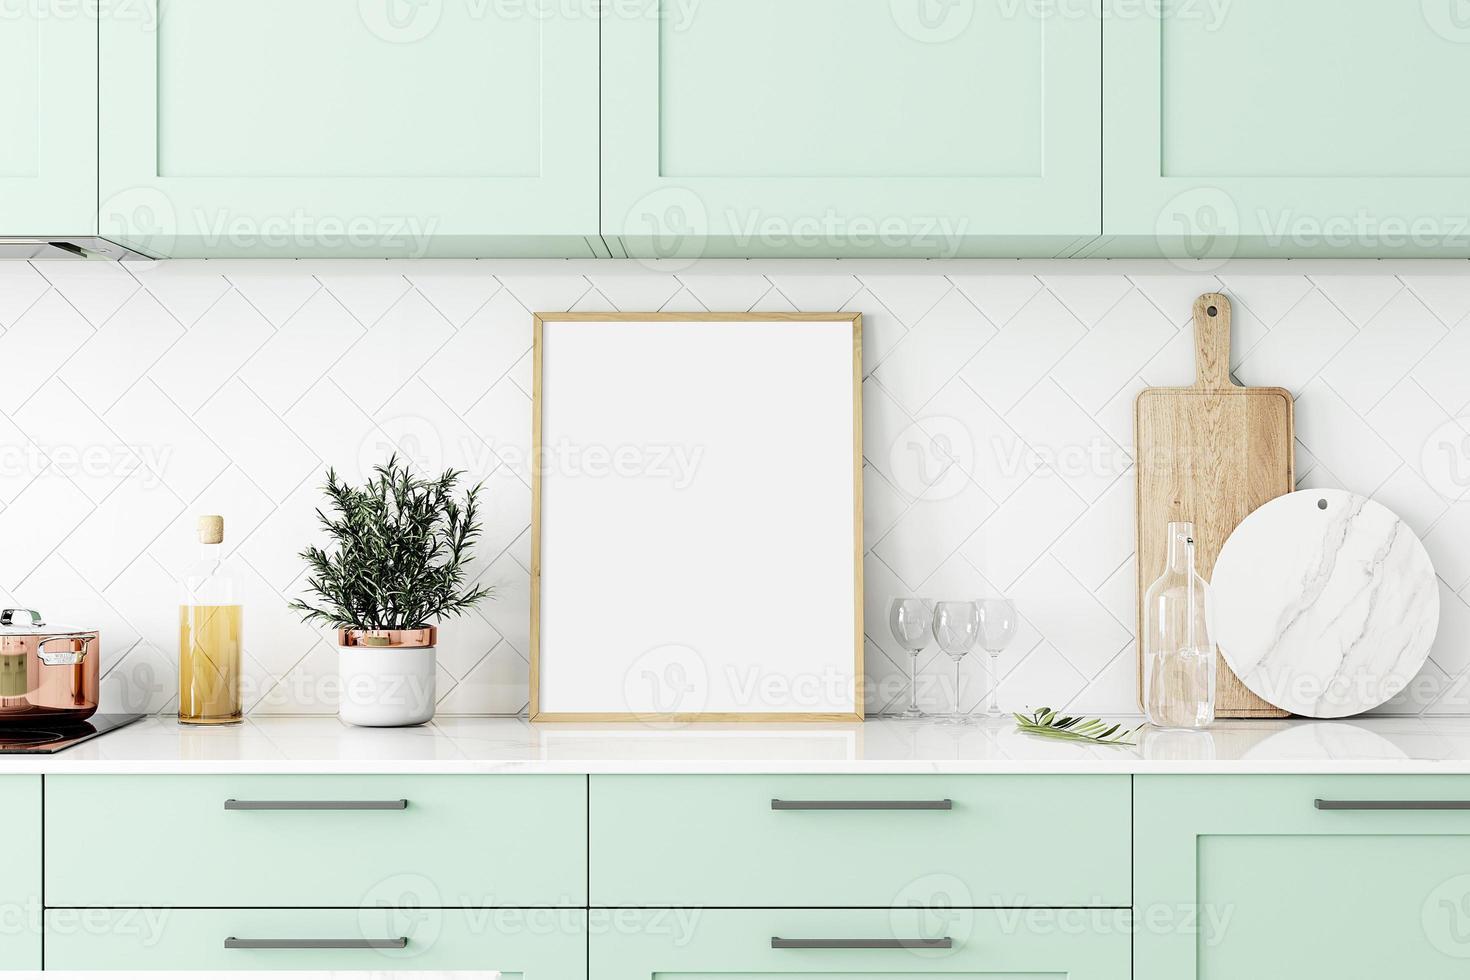 Küchenrahmenmodell foto